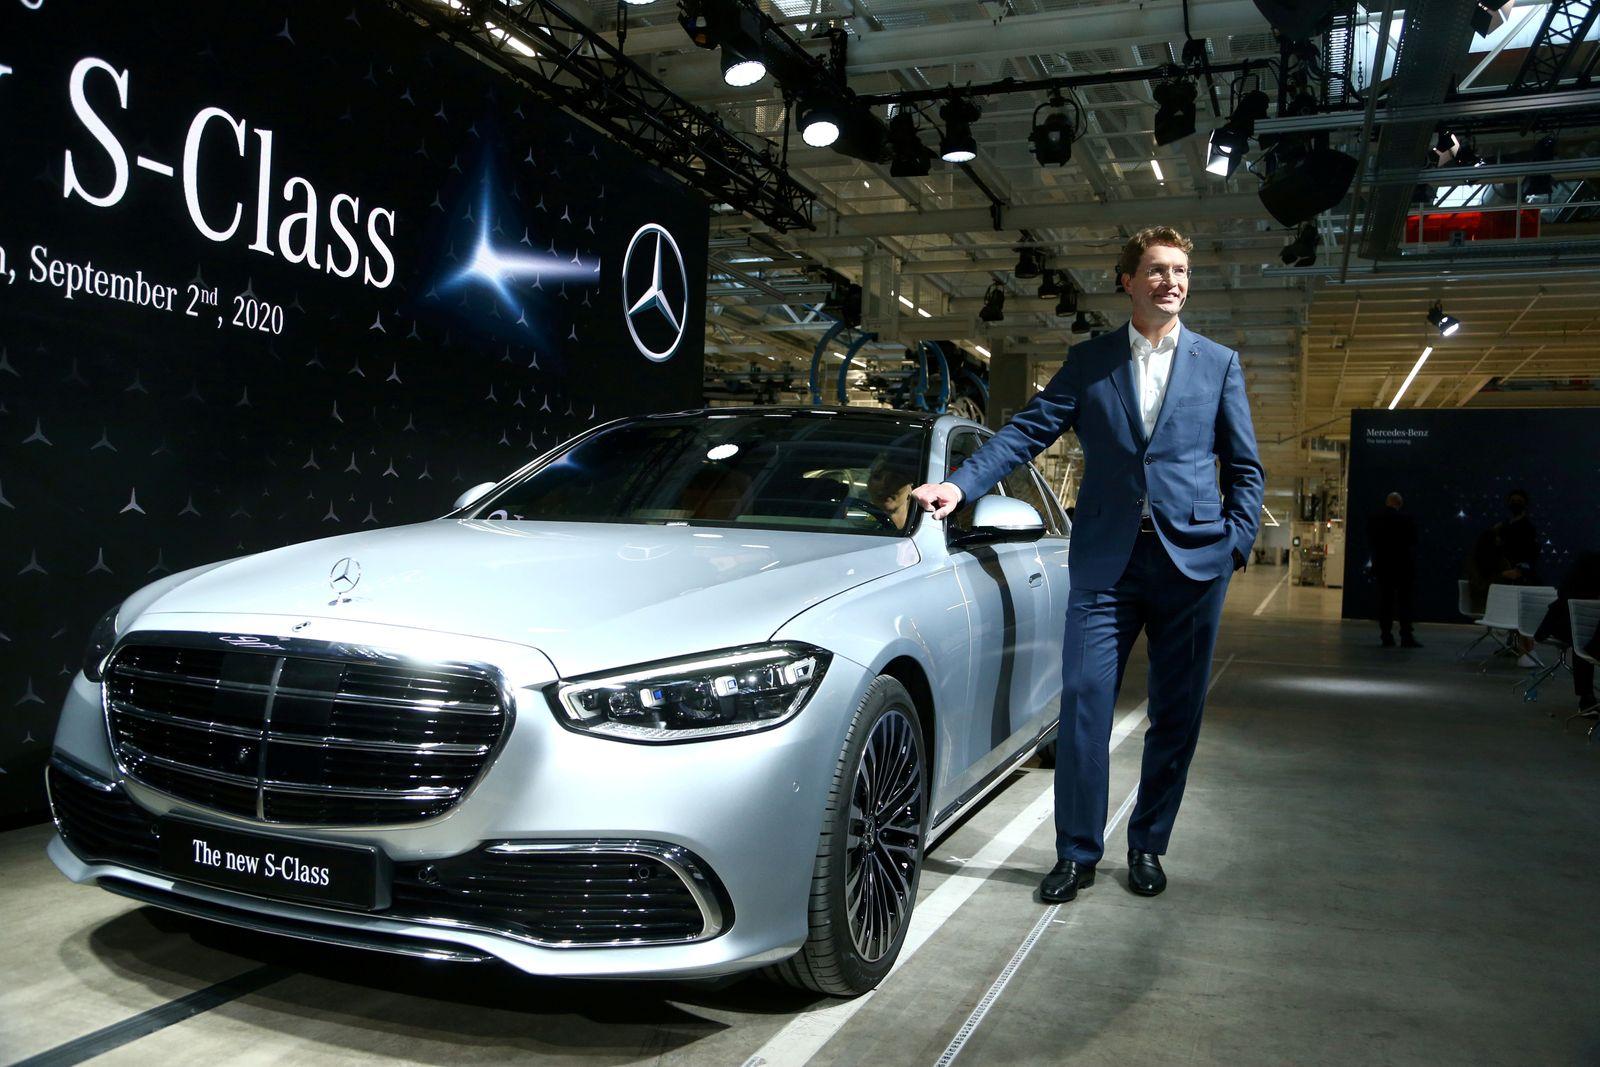 FILE PHOTO: FILE PHOTO: Daimler's Mercedes-Benz presents new S-Class